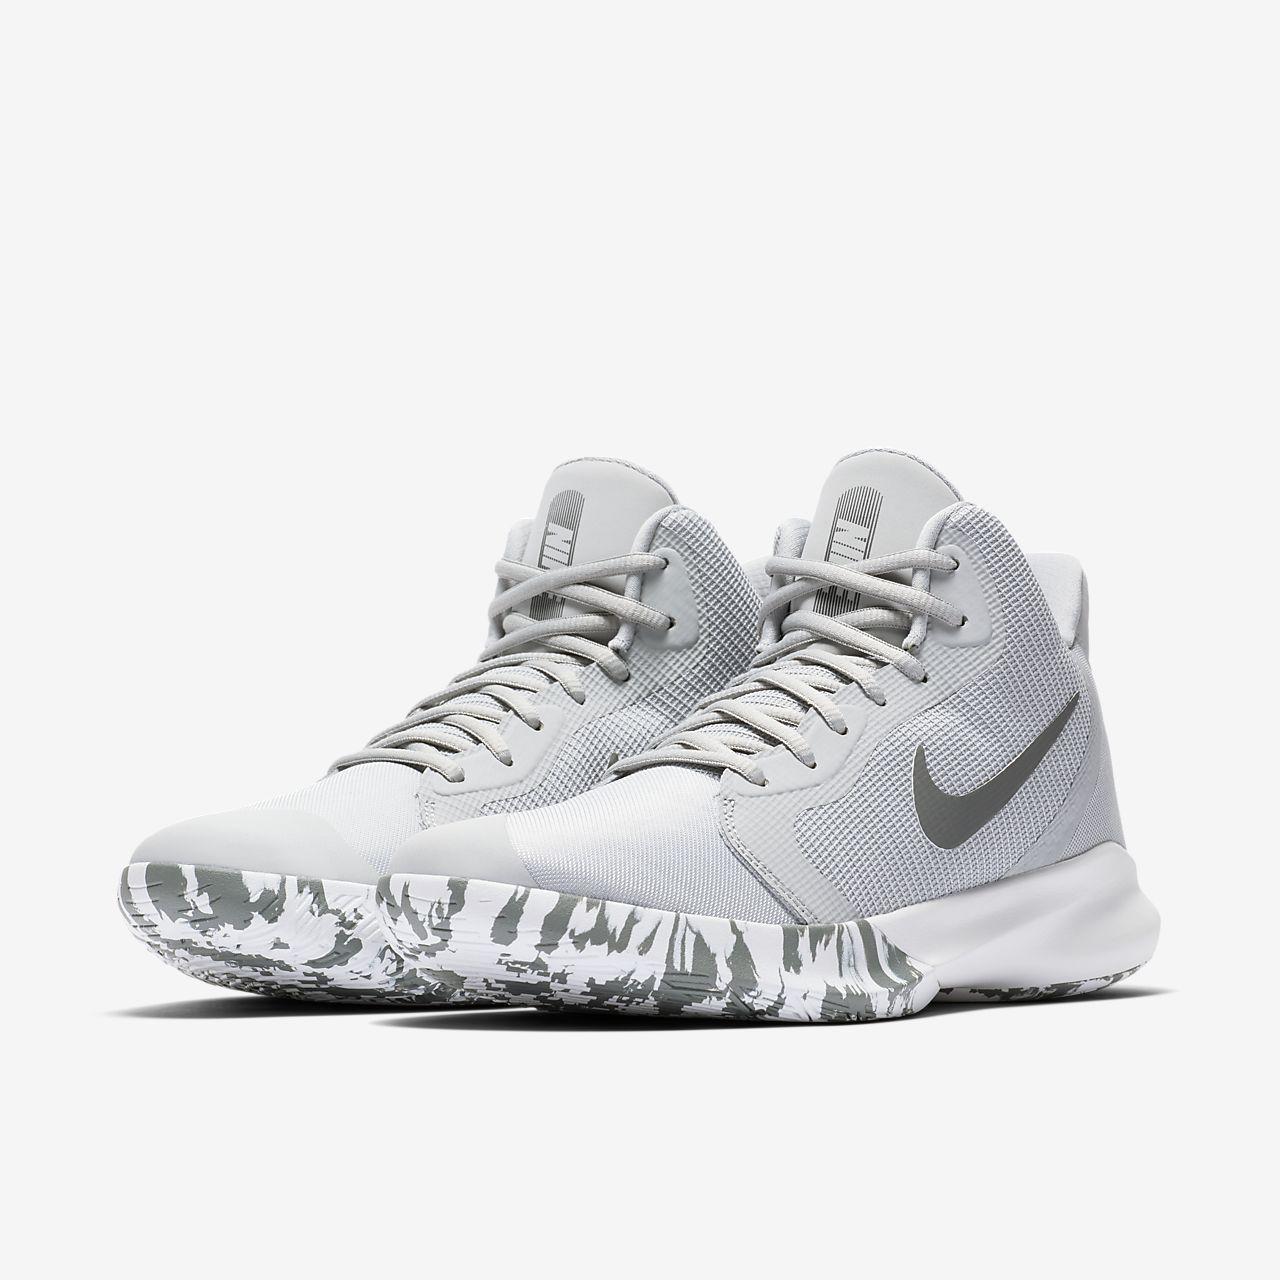 new style 90560 2f03d Nike Precision III Basketball Shoe